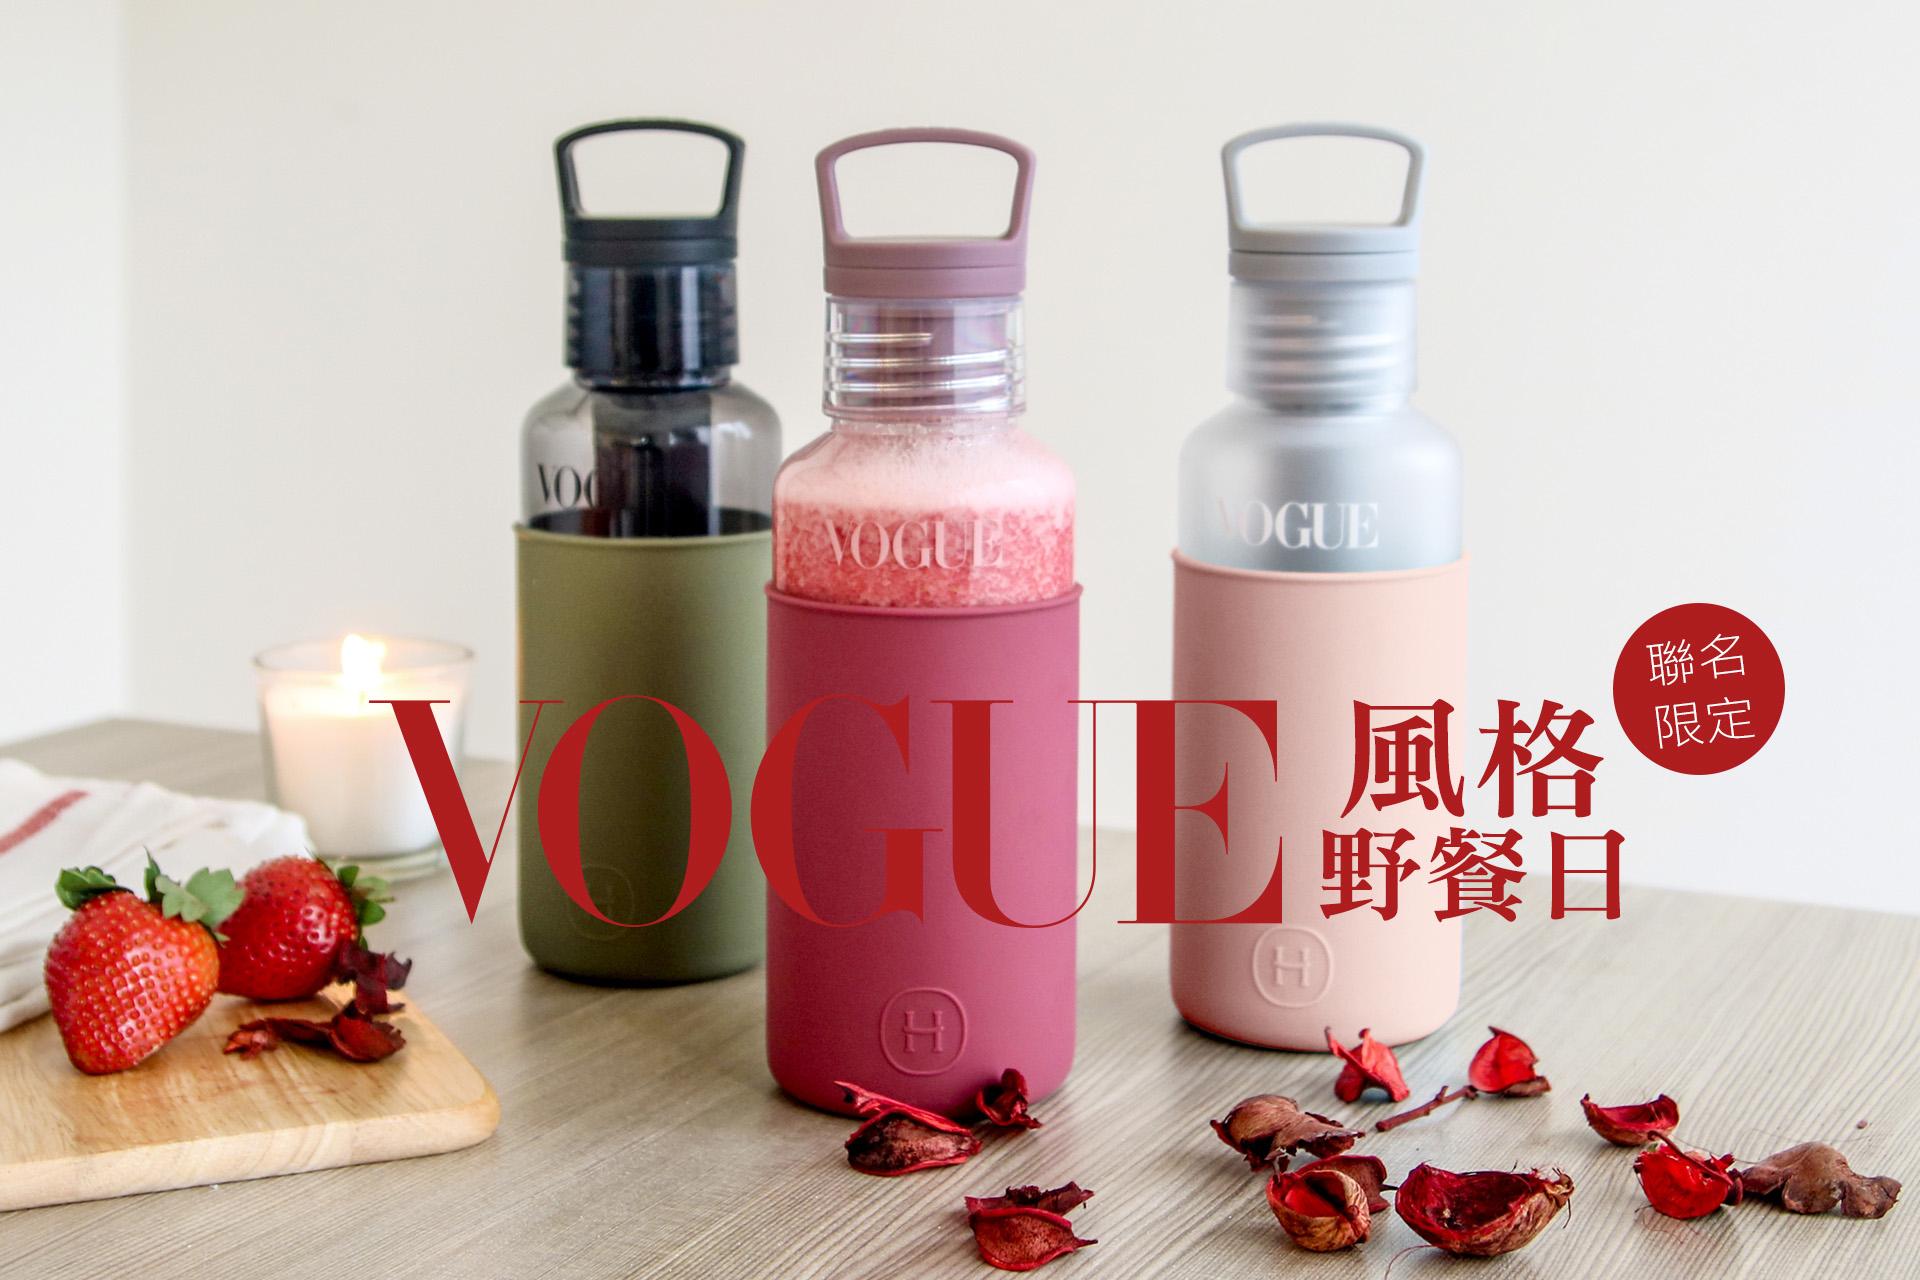 HYDY, 輕靚水瓶,美國HYDY, HYDY輕靚瓶, 來自美國的時尚水瓶, IG部落客推薦, 五星好評, 不鏽鋼, 進口